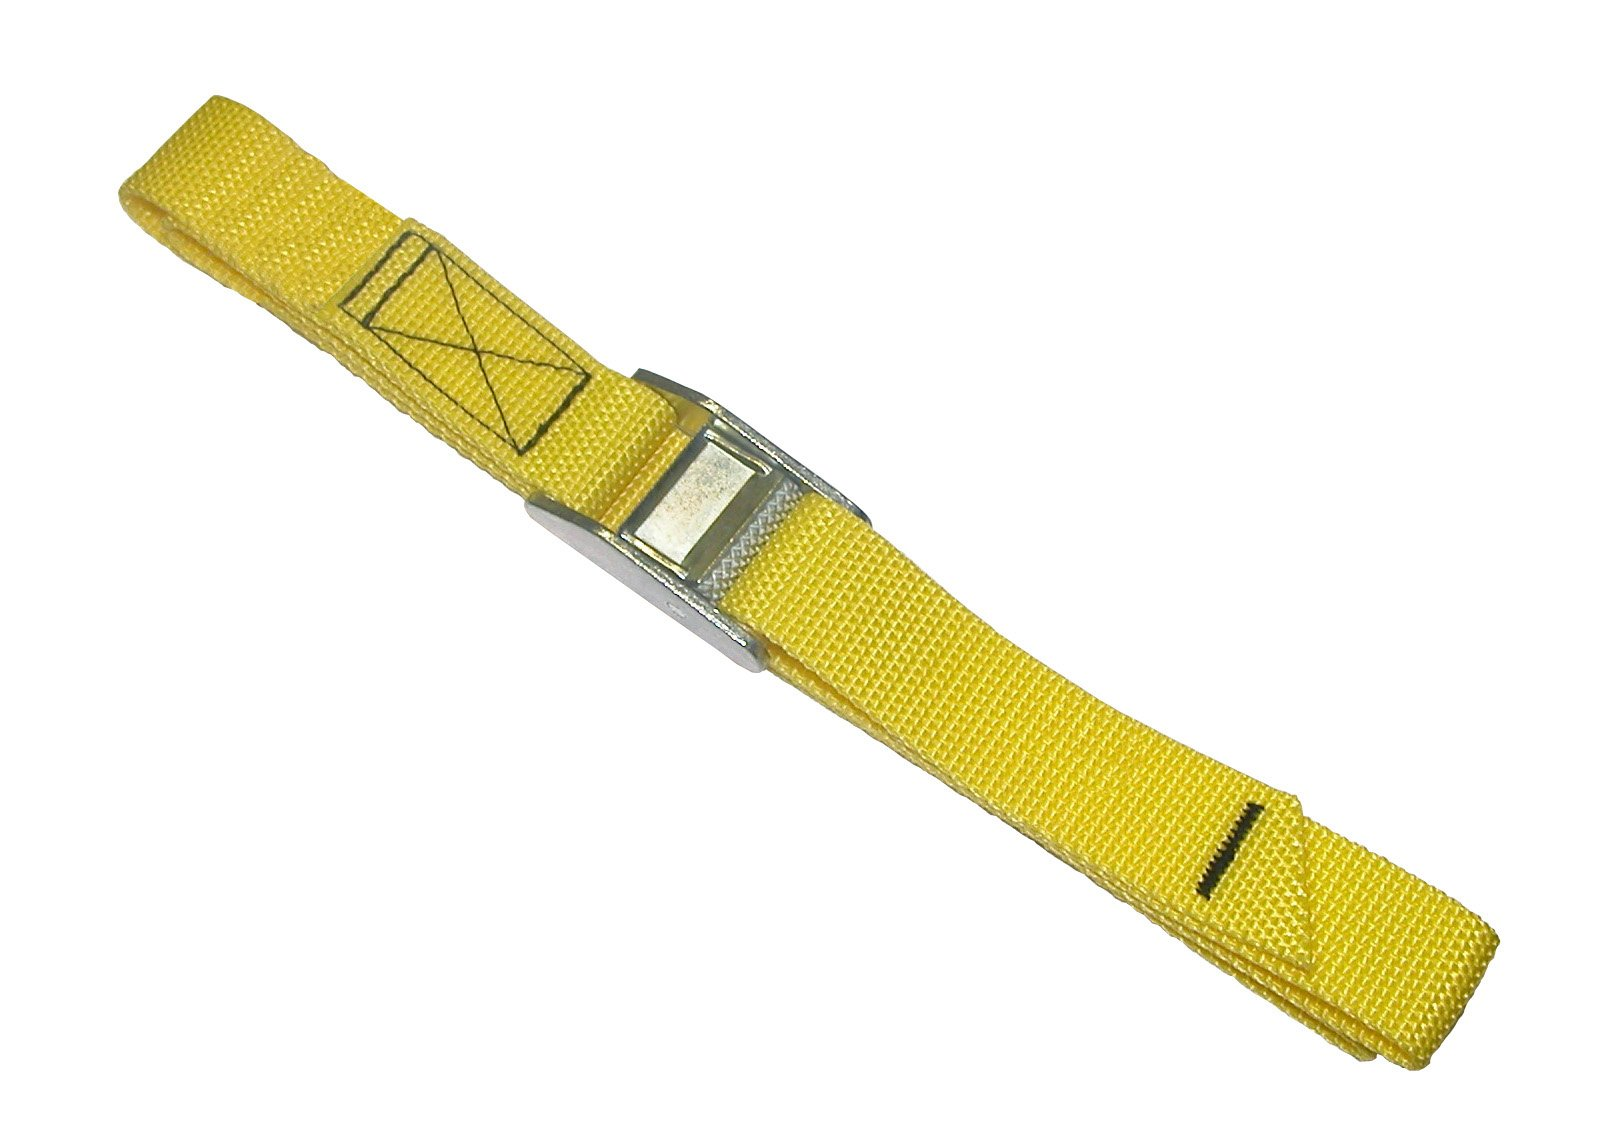 CLC Custom Leathercraft 2WS04 Strap-It Web Tie Down Straps, Yellow, 4-Foot, 2-Pack by Custom Leathercraft